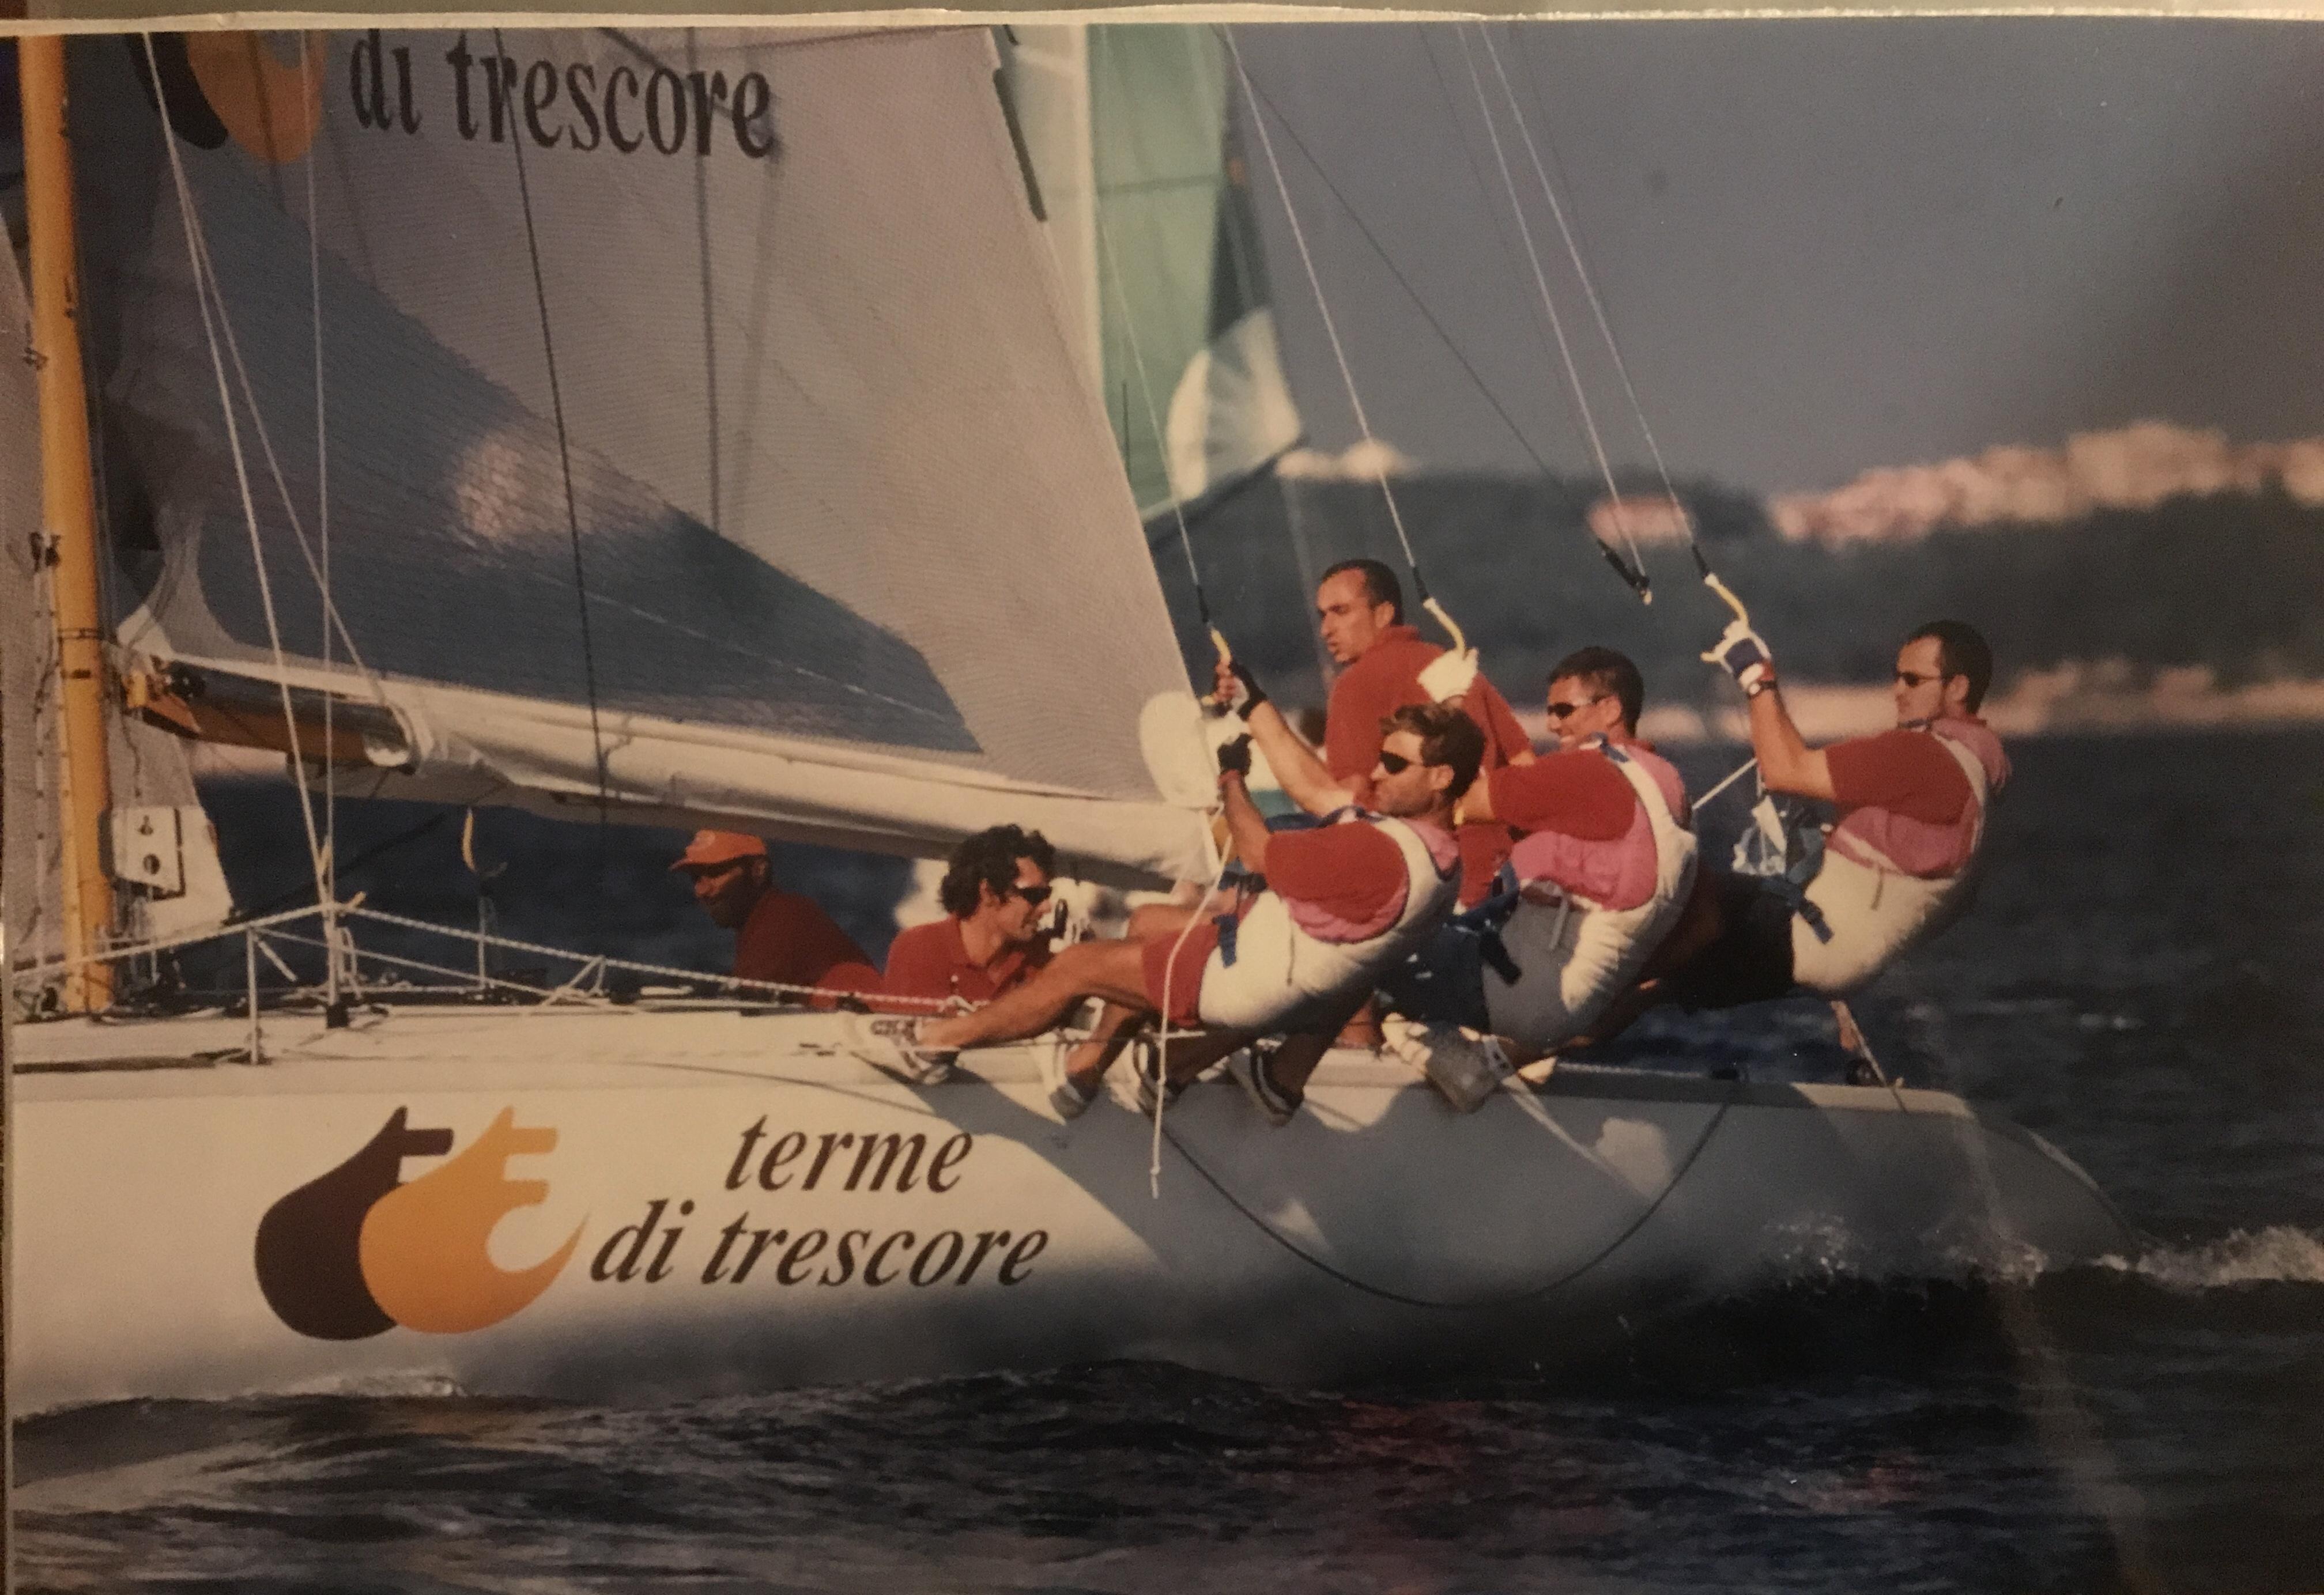 campionato europeo Asso 99 .JPG